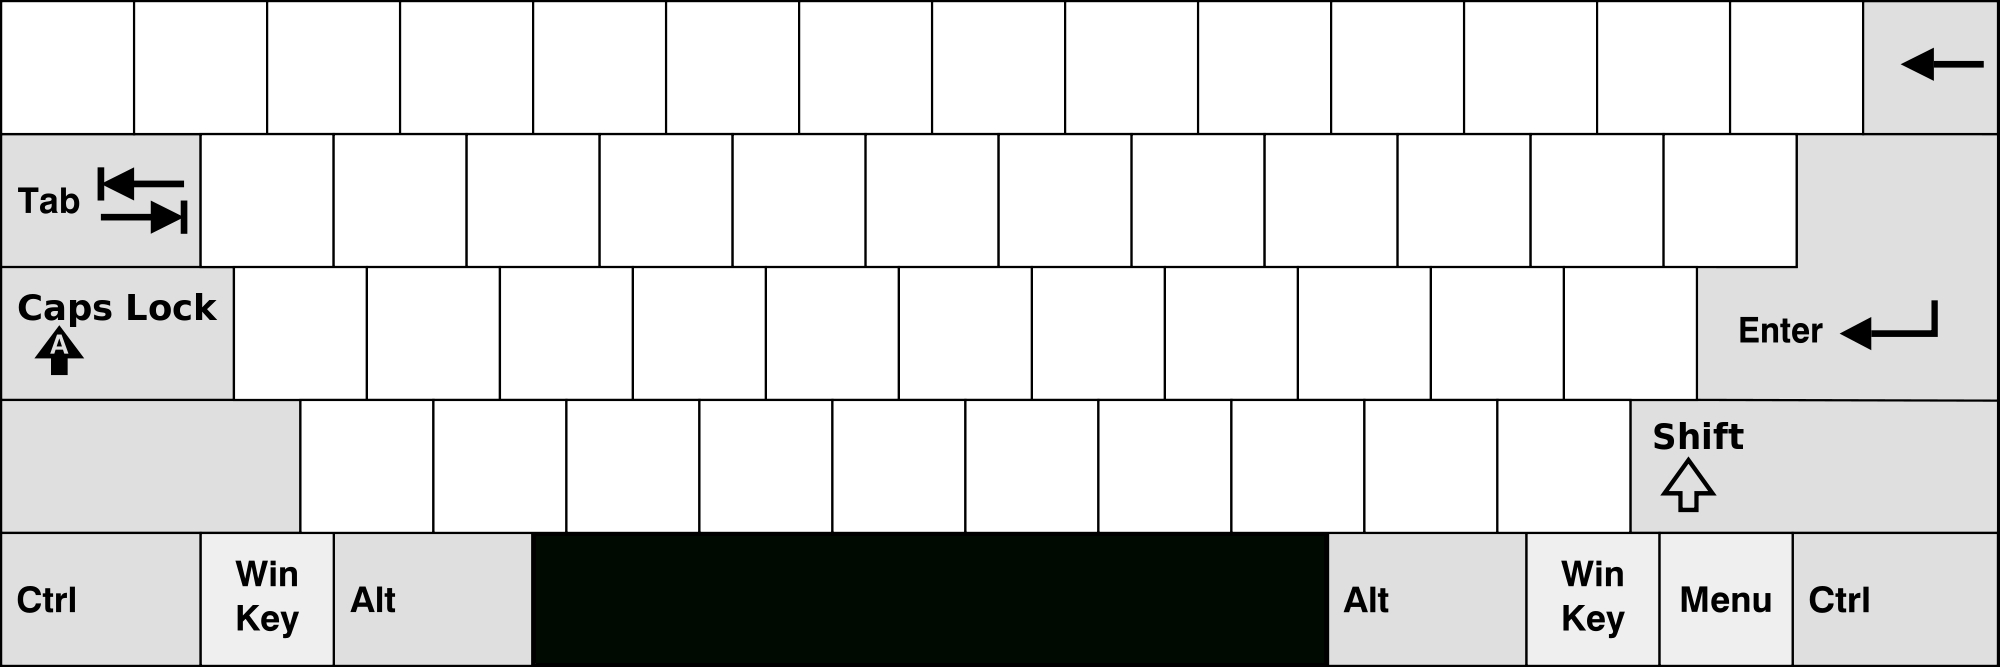 Printable Computer Keyboard Template. Keyboard Template Printable   Blank Keyboard Worksheet Printable